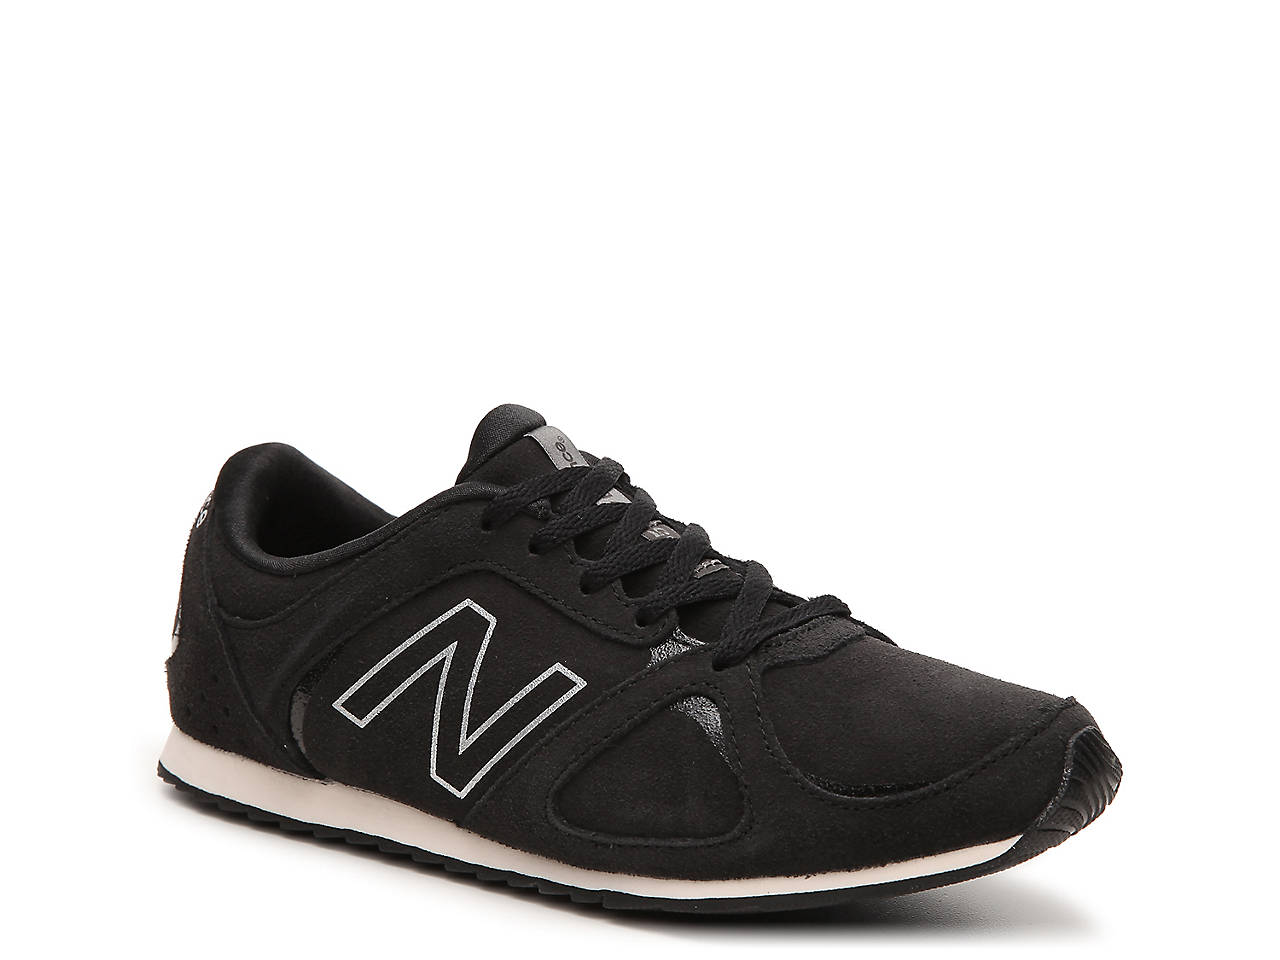 555 Retro Suede Sneaker - Women's